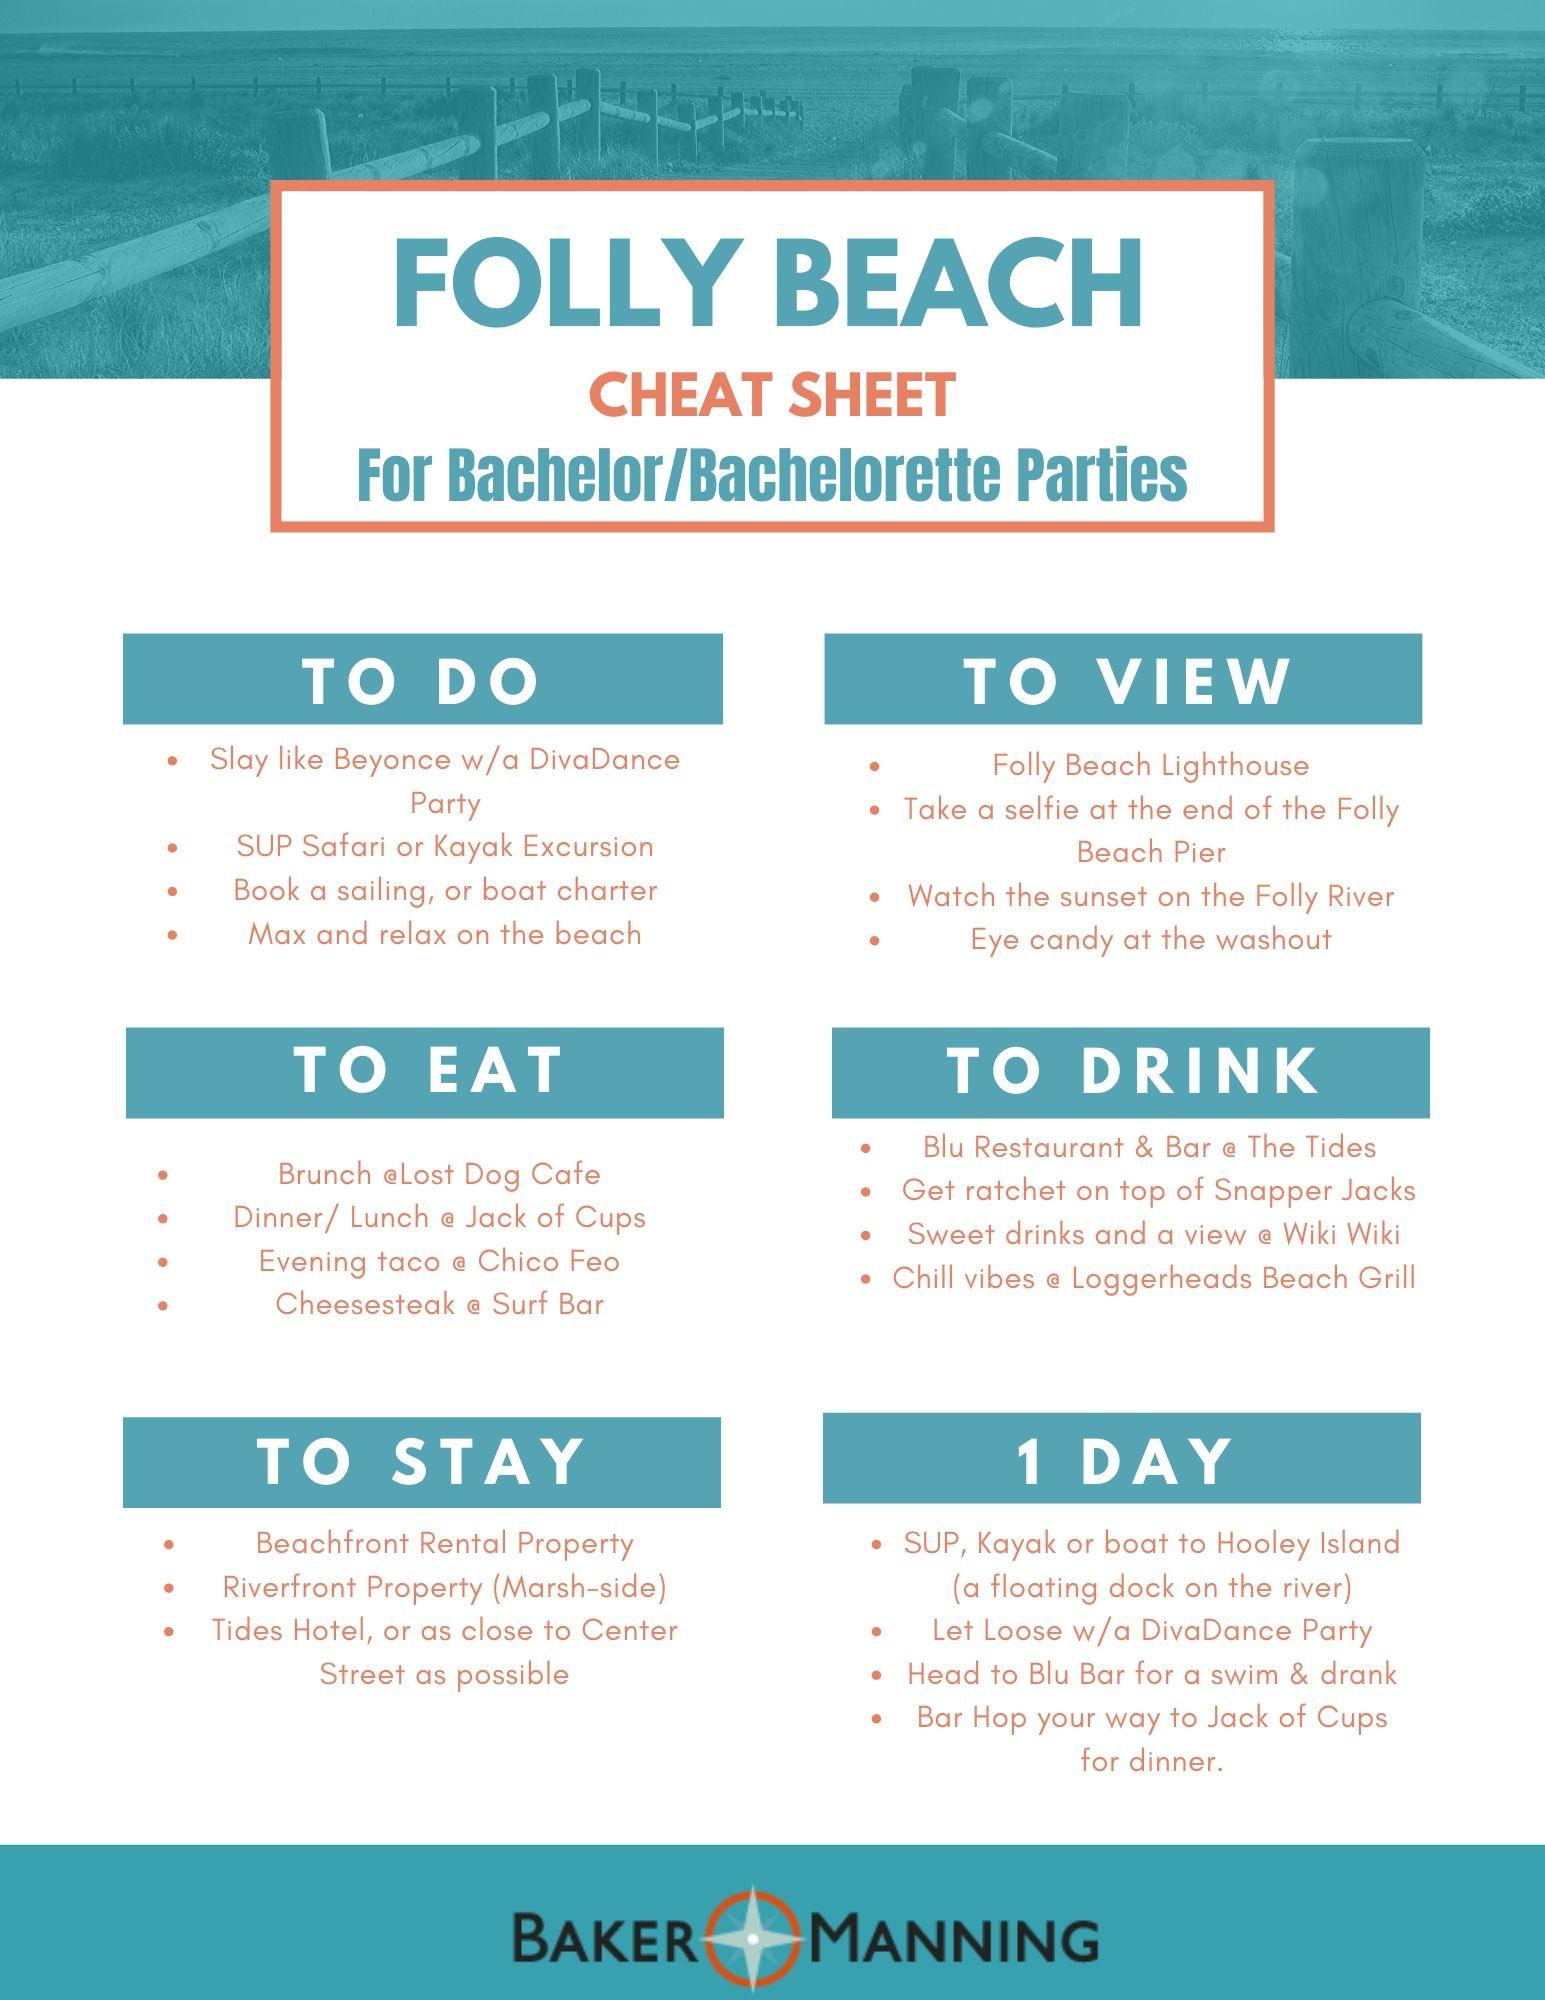 Folly Beach Cheat Sheet 2.0